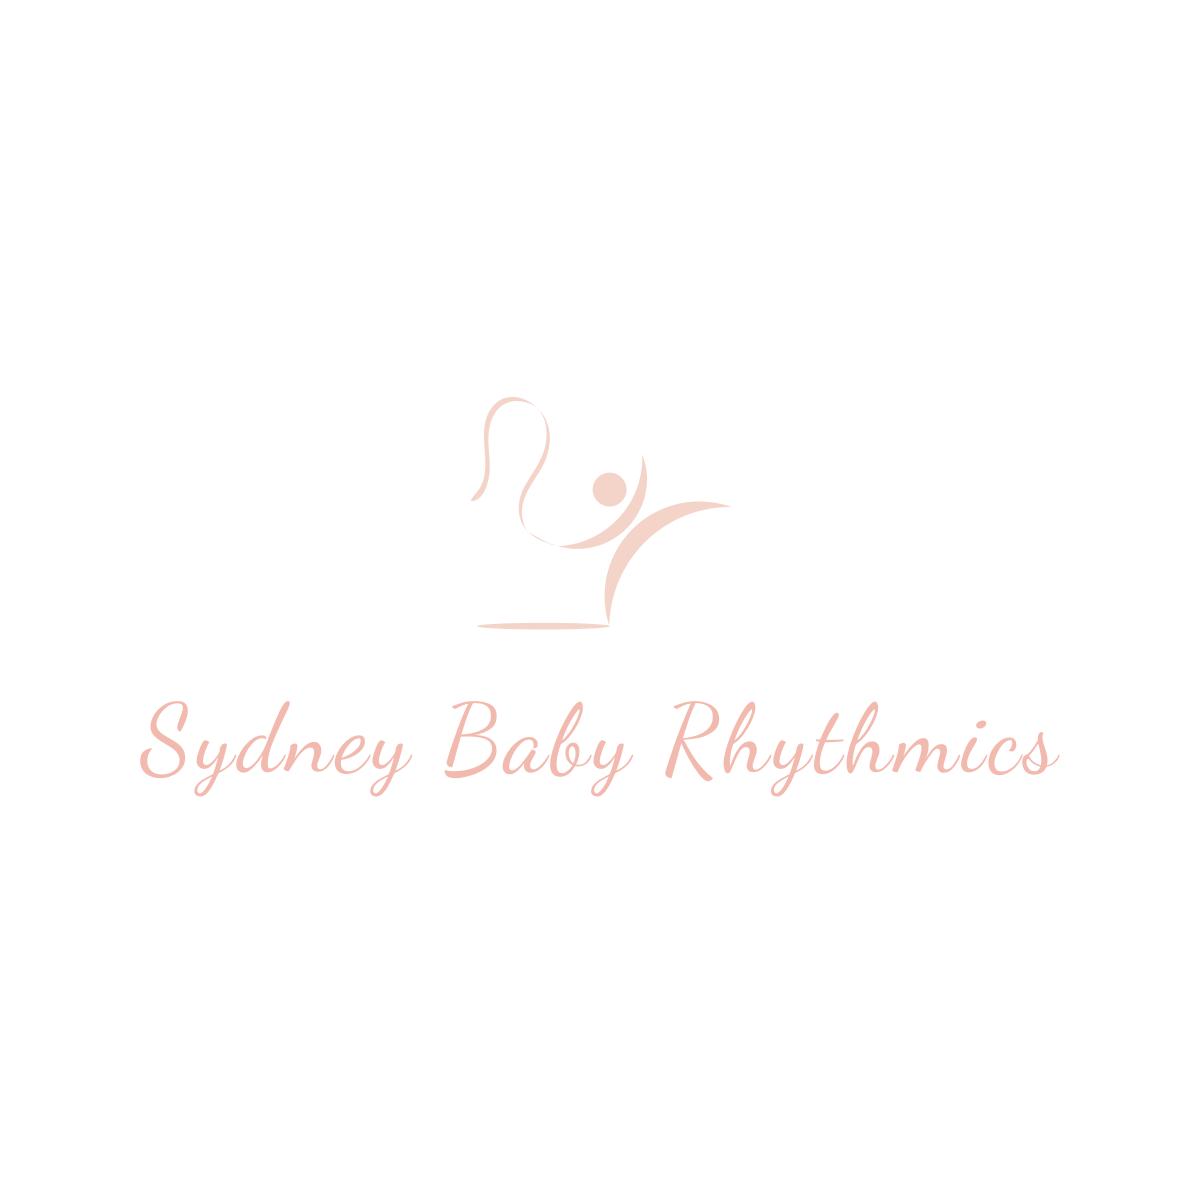 Sydney Baby Rhythmics